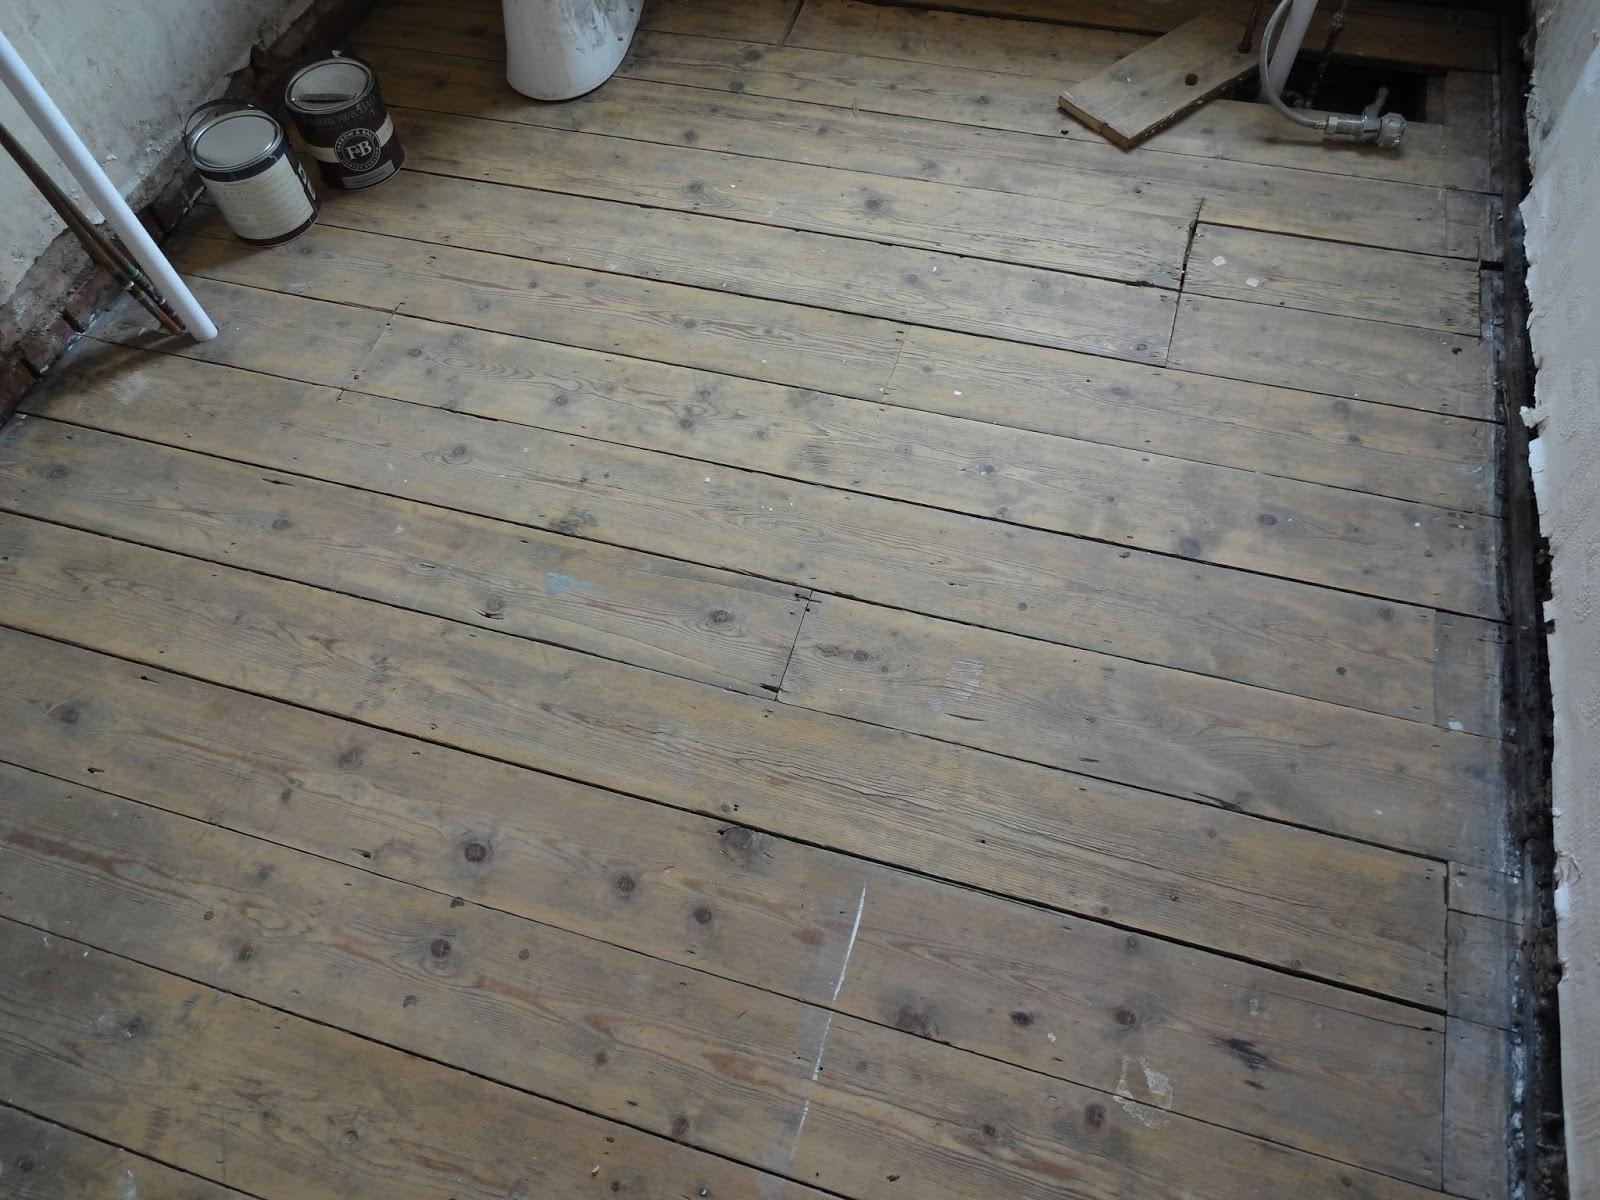 Bathroom floor boards - Cleaning Floorboards